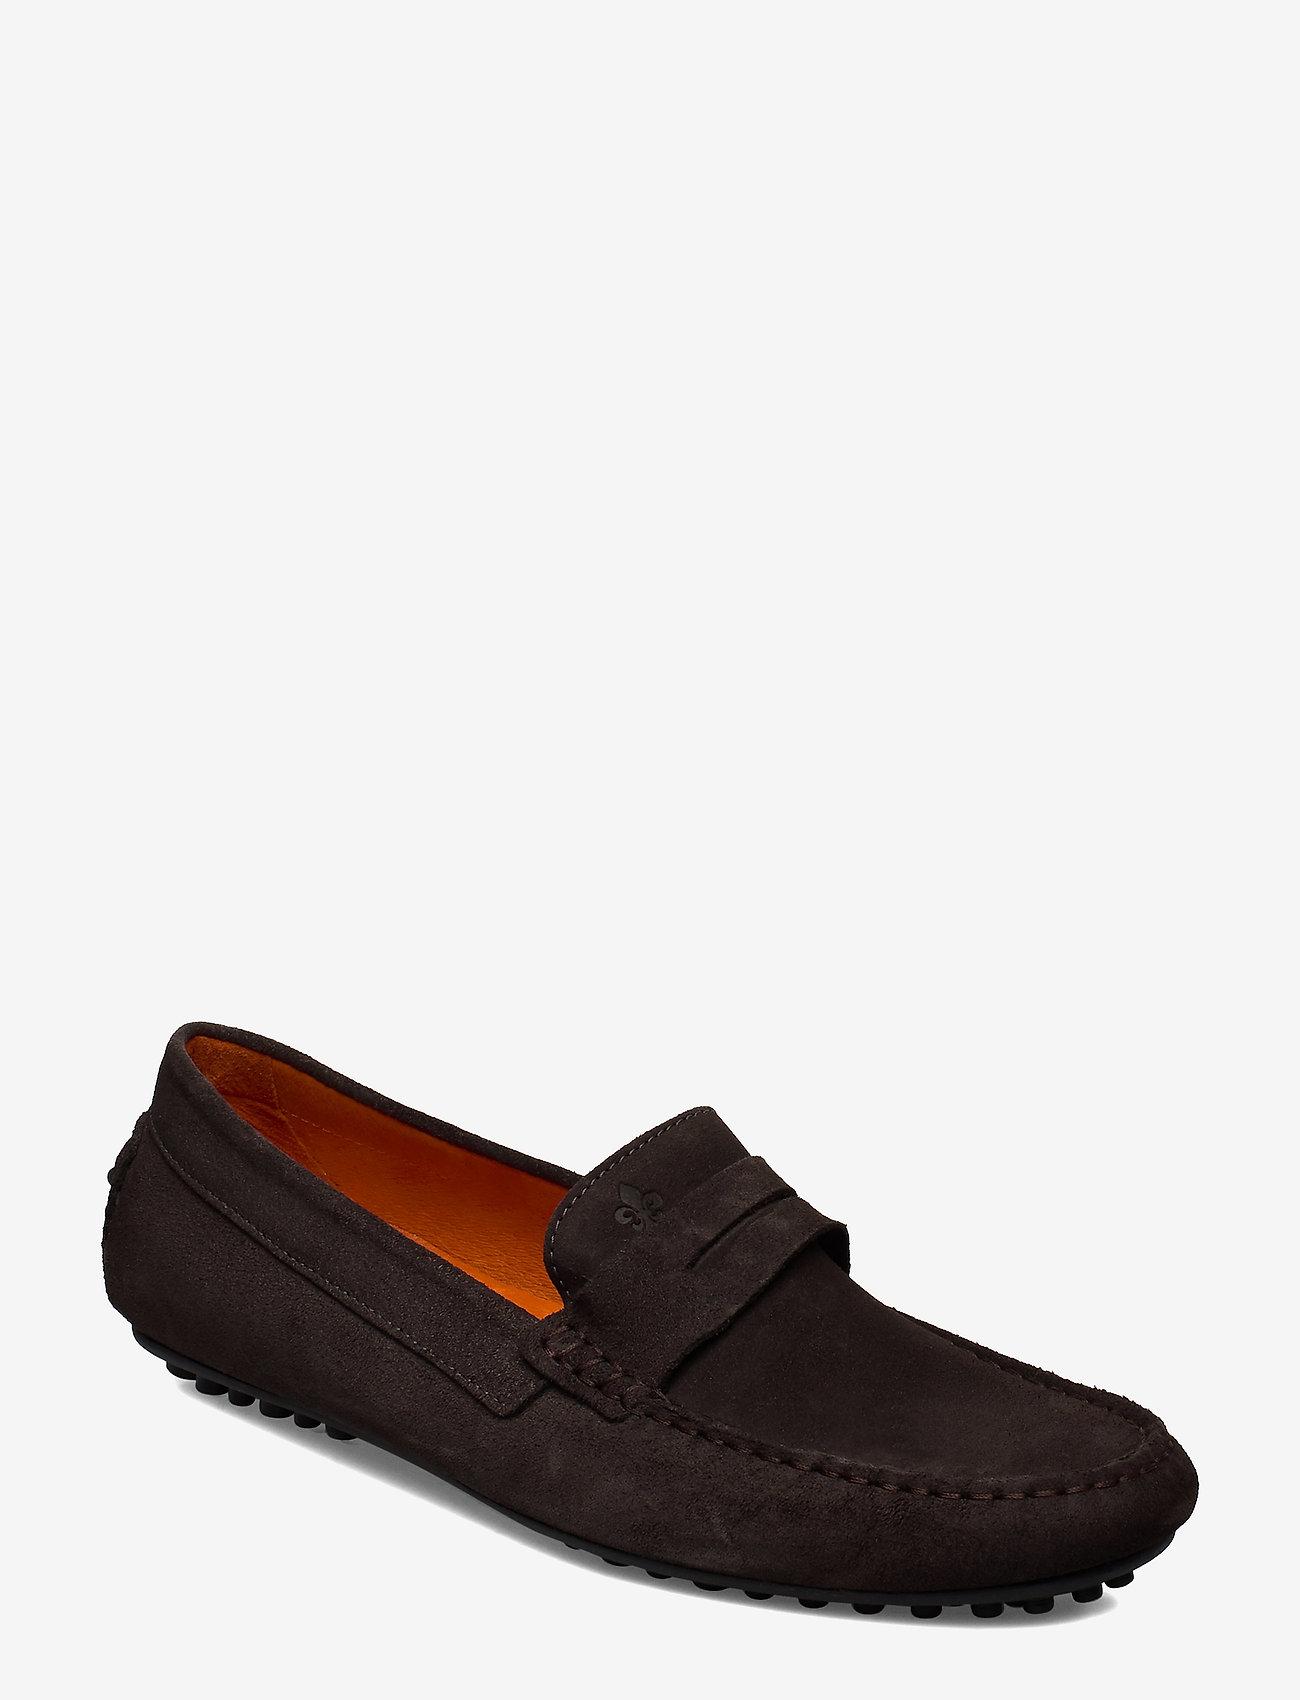 Morris - Agira Carshoe - loafers - brown - 0